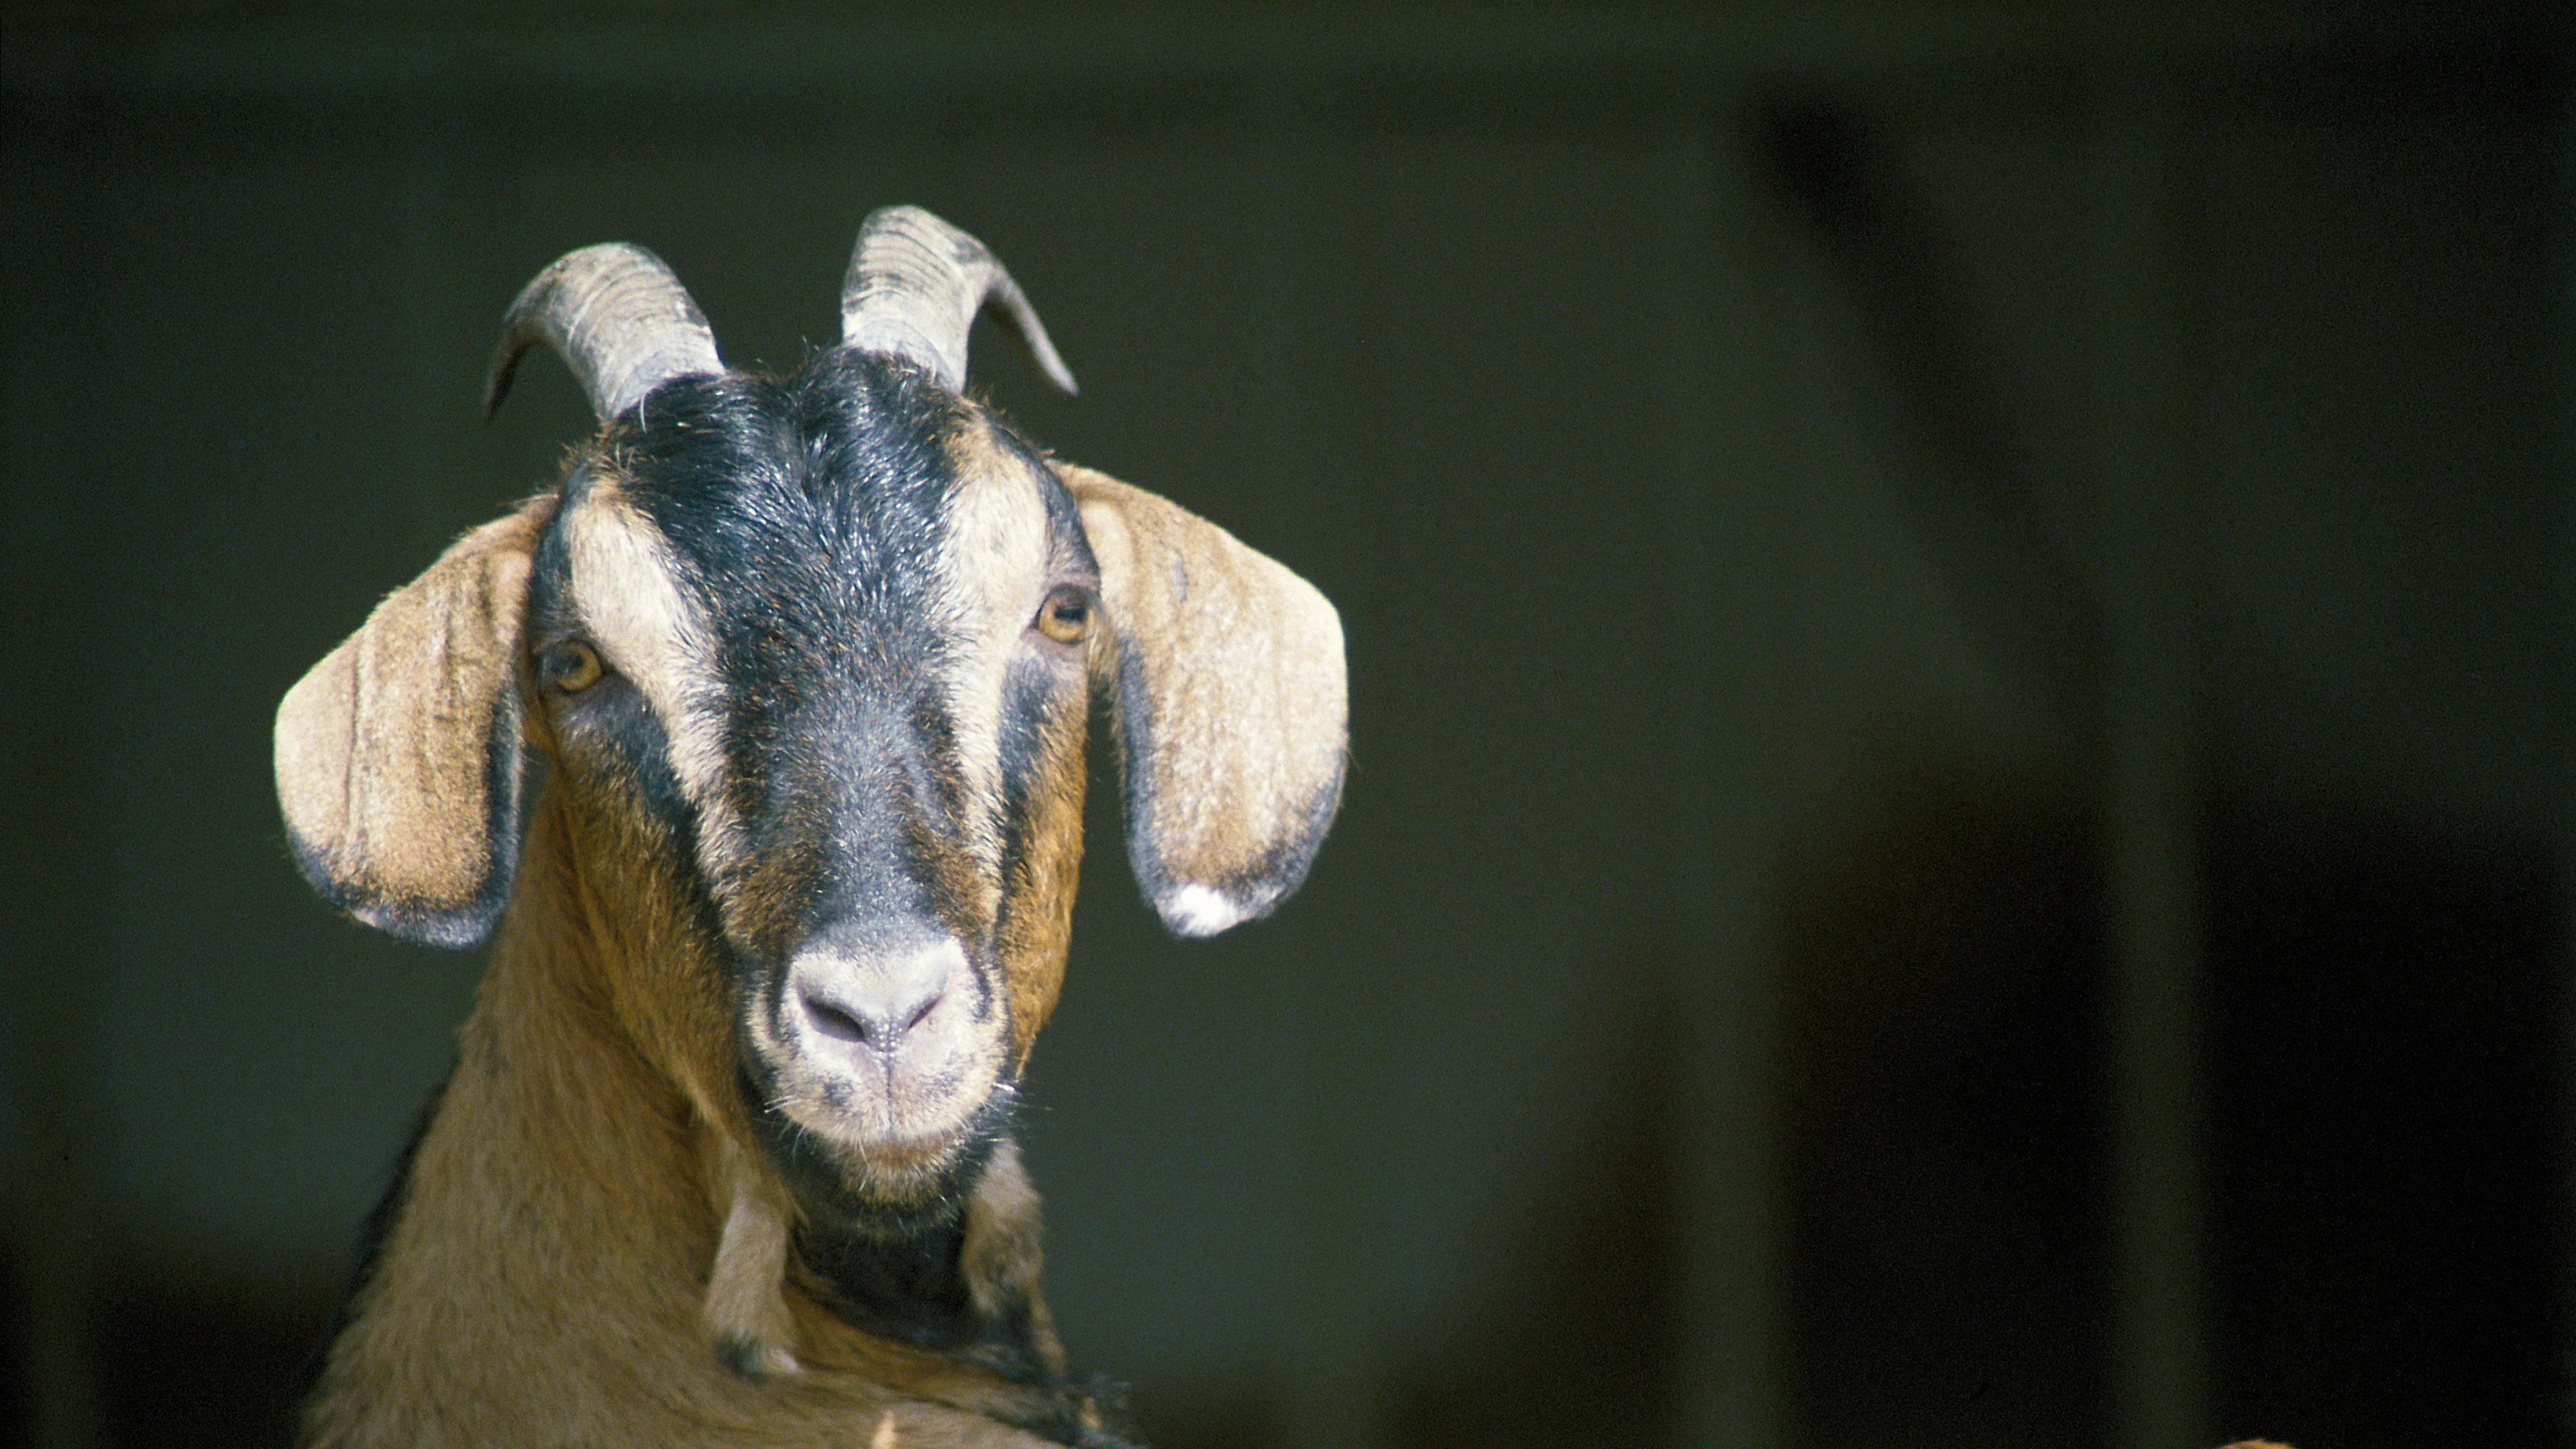 goat horns hooves 4k 1542241600 - goat, horns, hooves 4k - Horns, hooves, goat